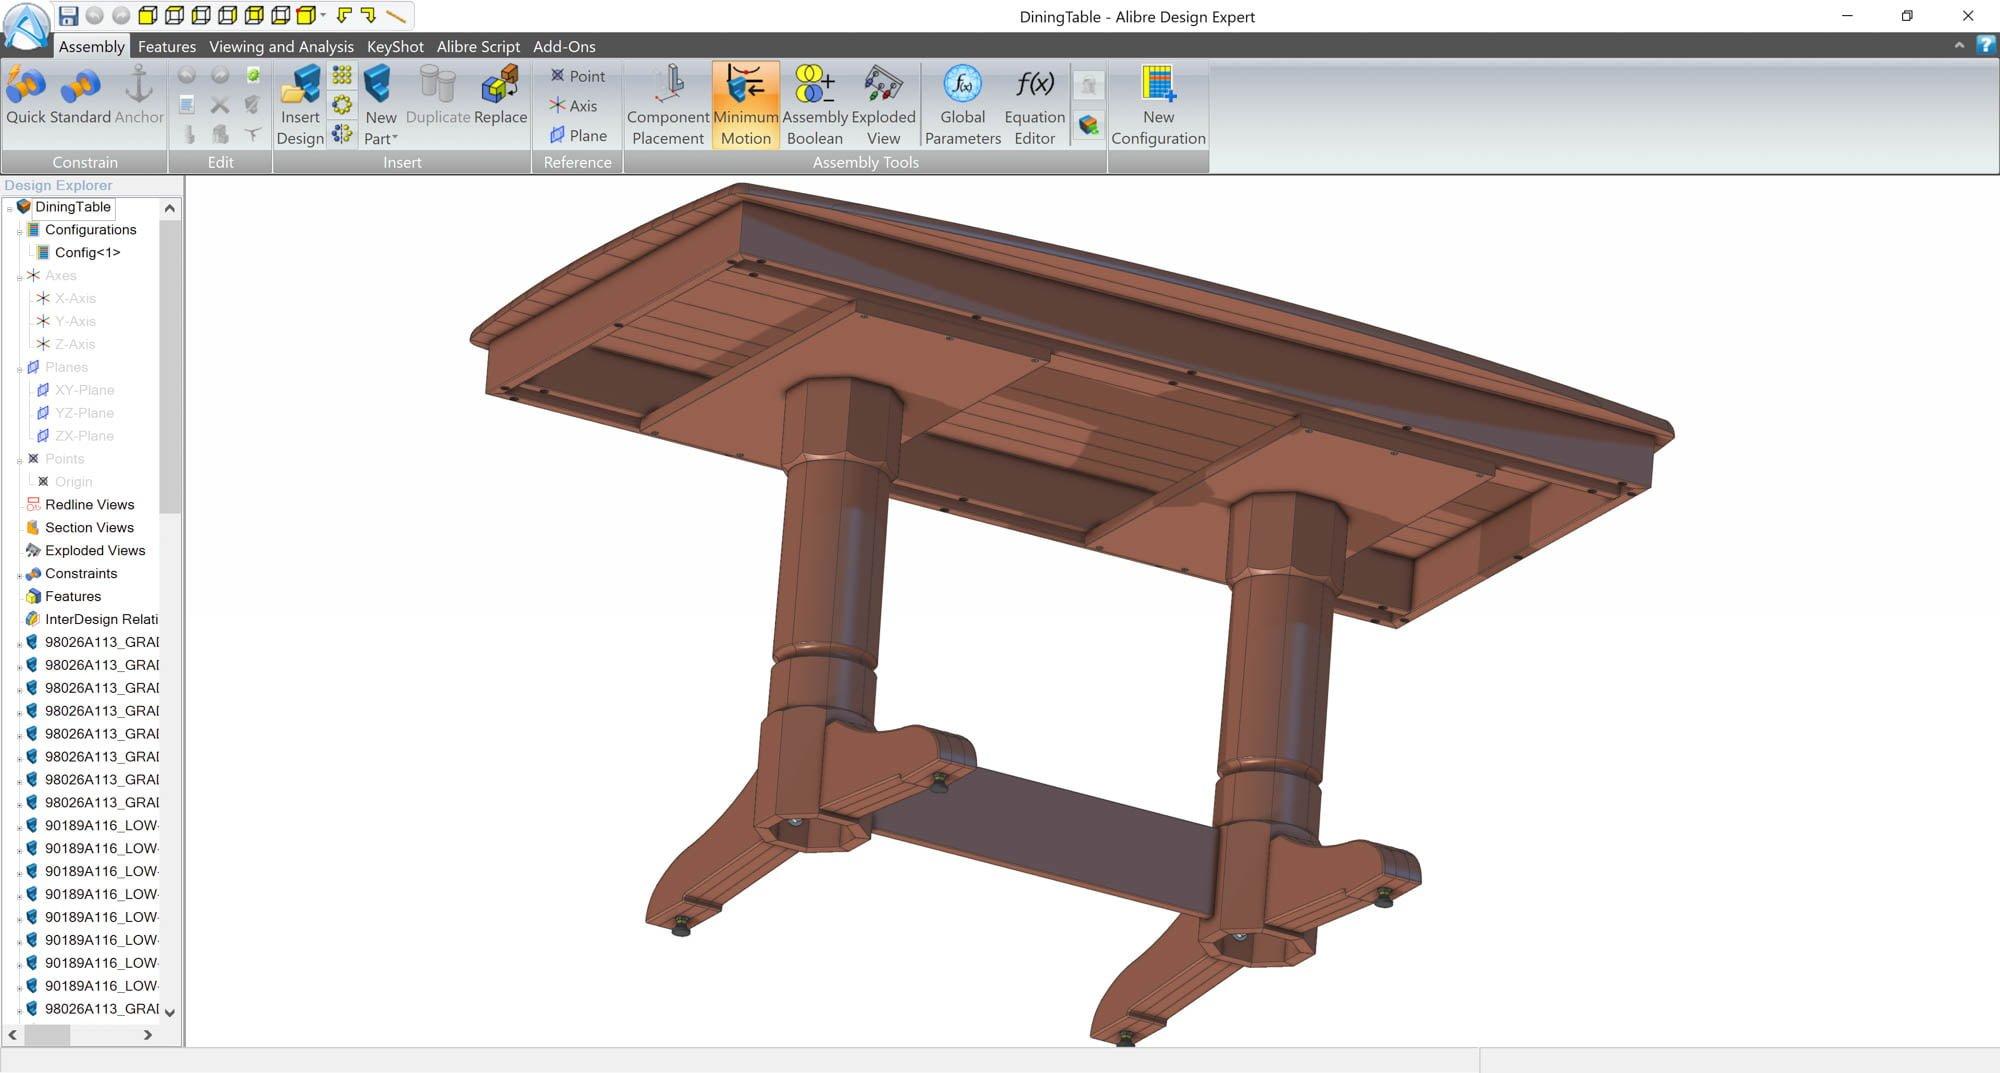 alibre-design-zrzut-ekranu-branza-stolarska-drewniany-stol